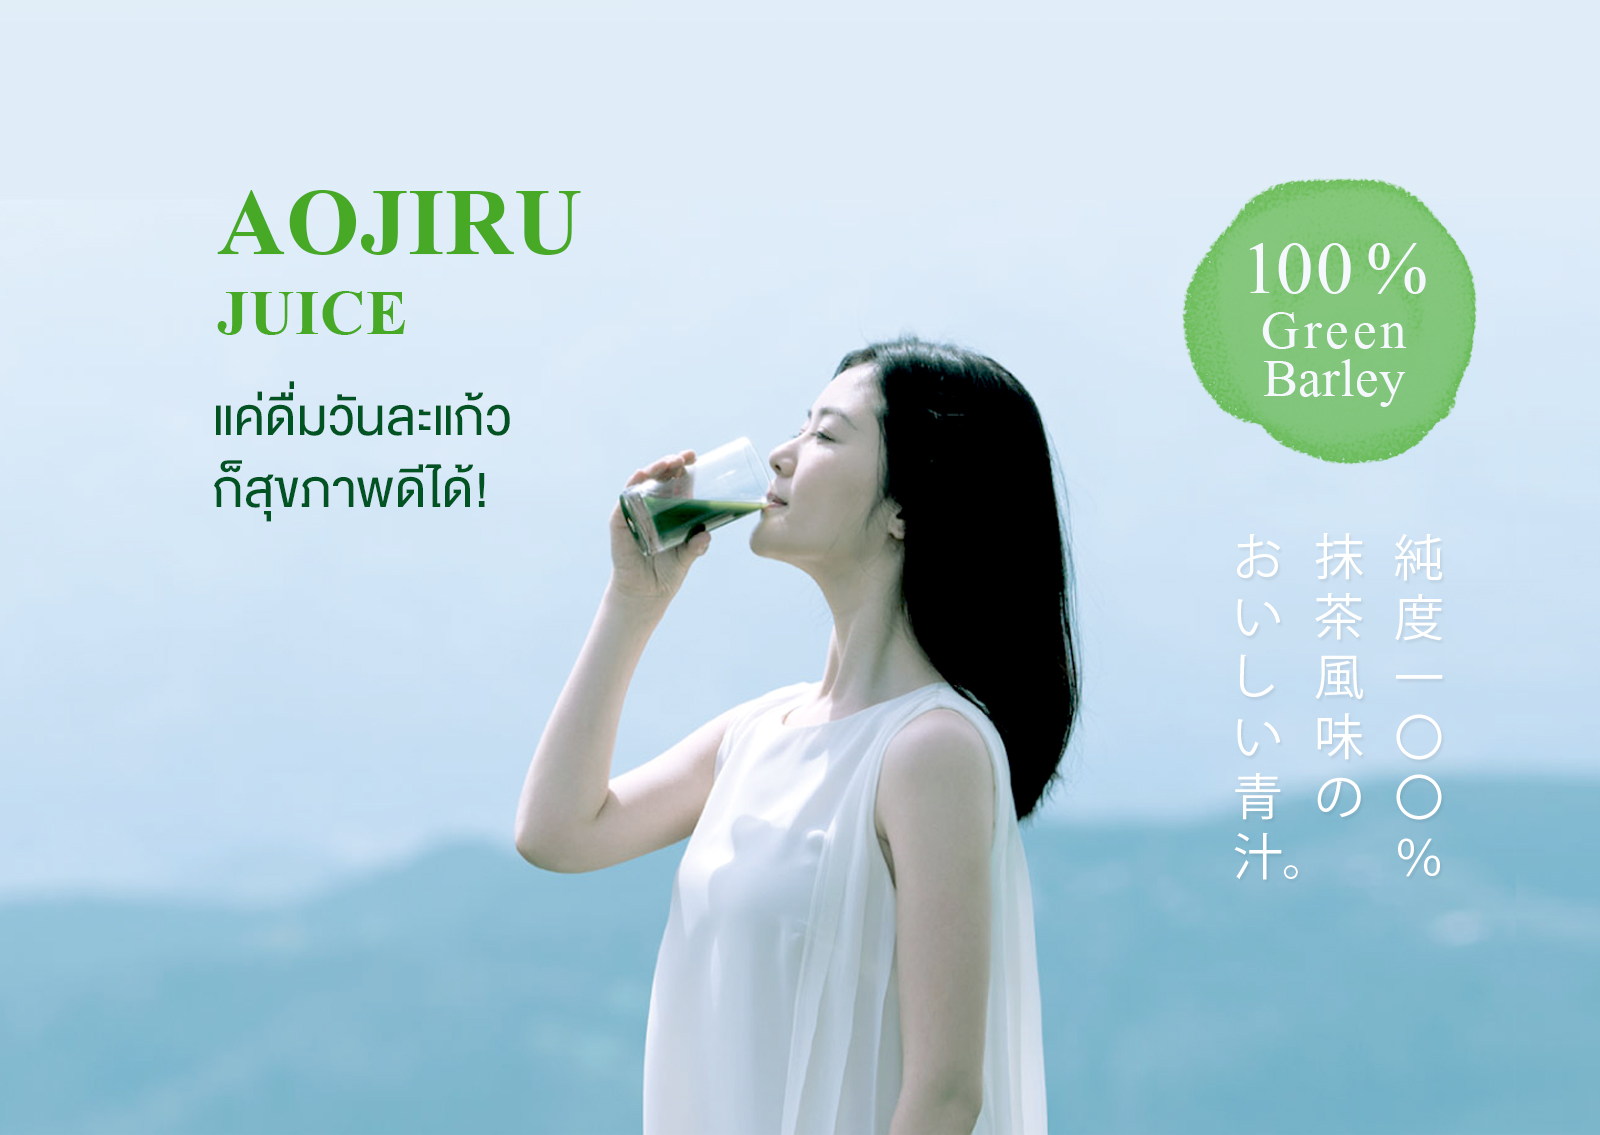 AOJIRU JUICE แค่ดื่มวันละแก้ว ก็สุขภาพดีได้! 100 % Green Barley